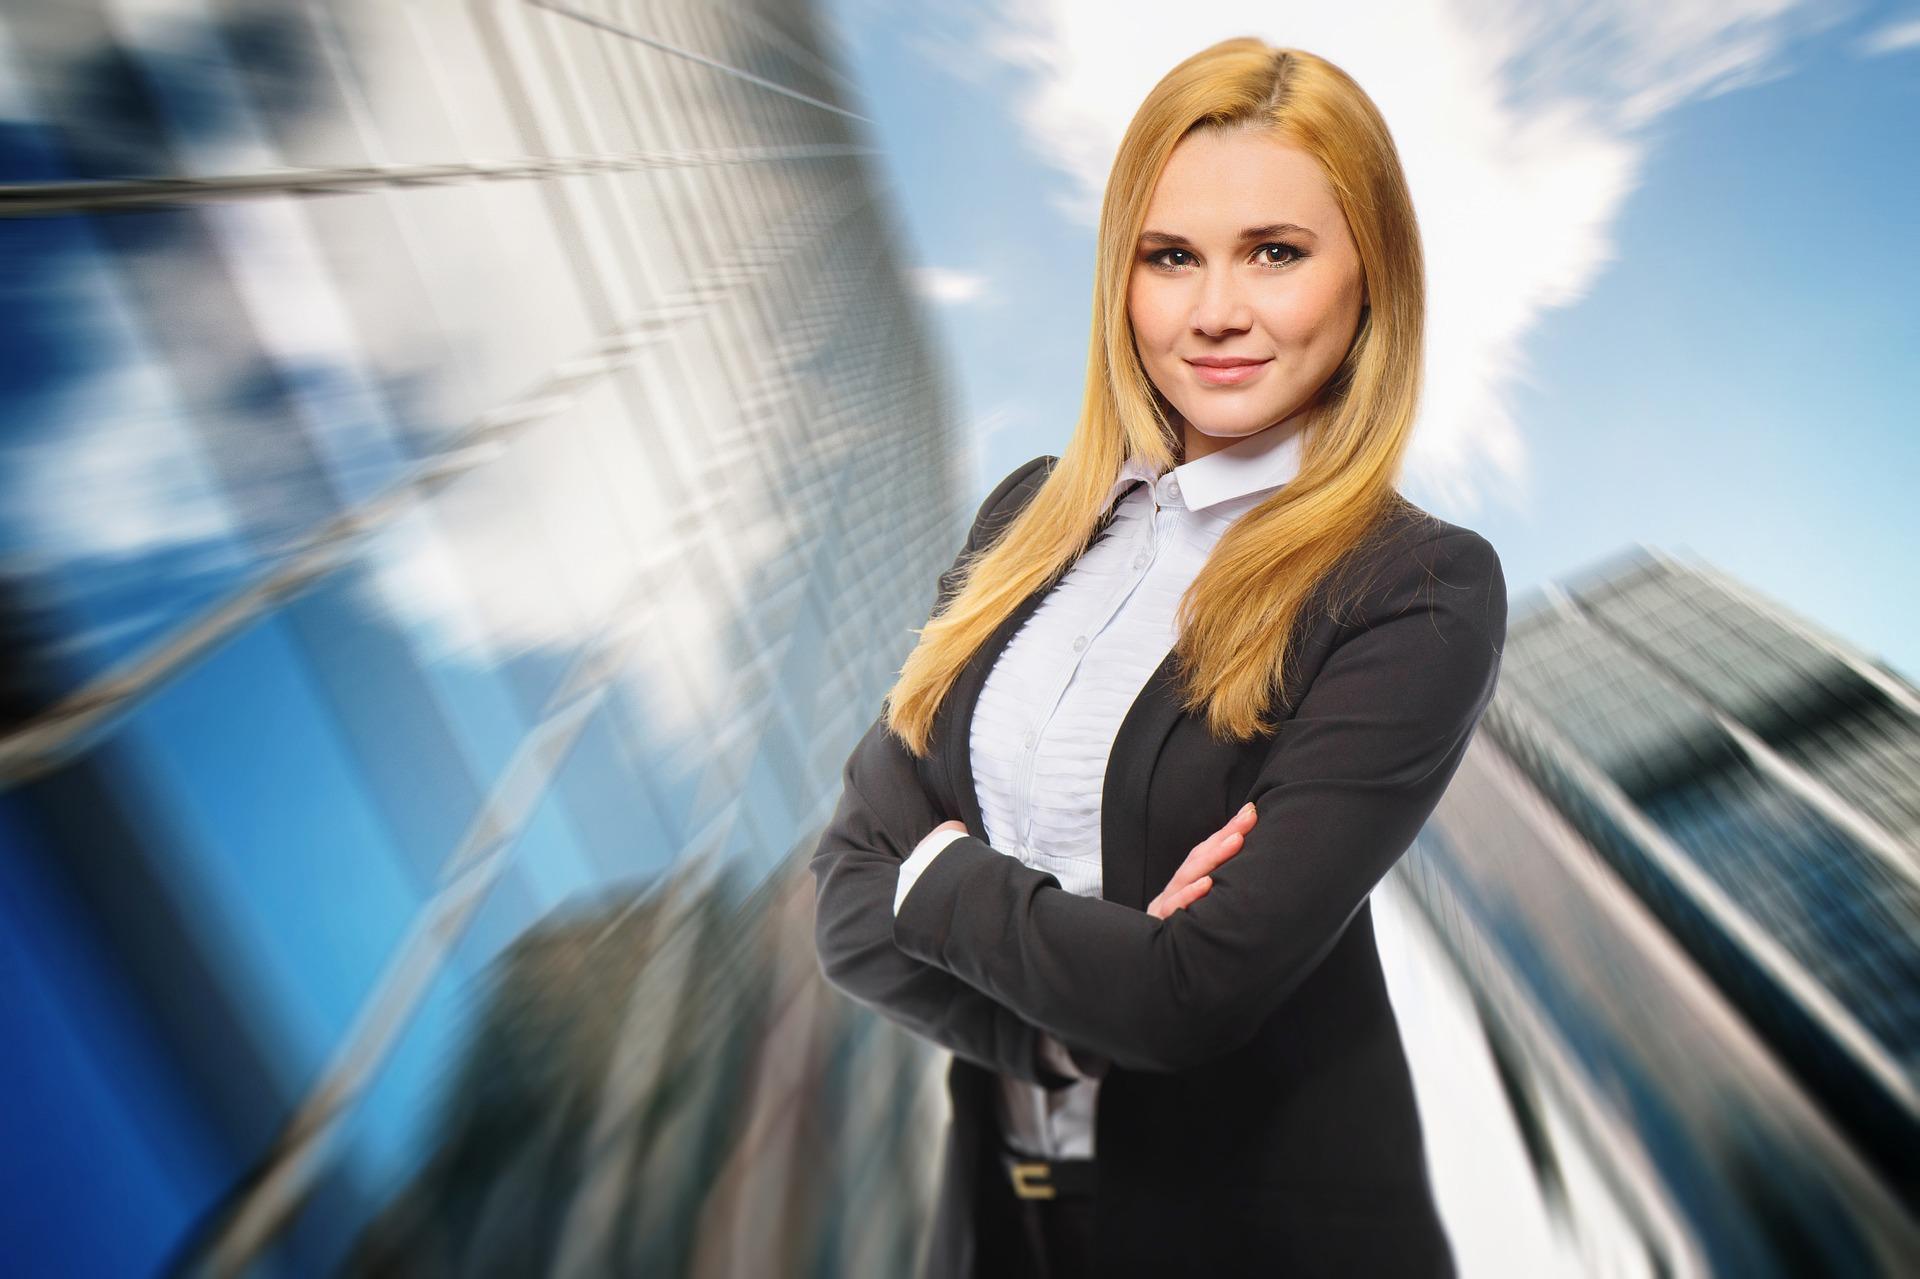 mlm-network-marketing-companies